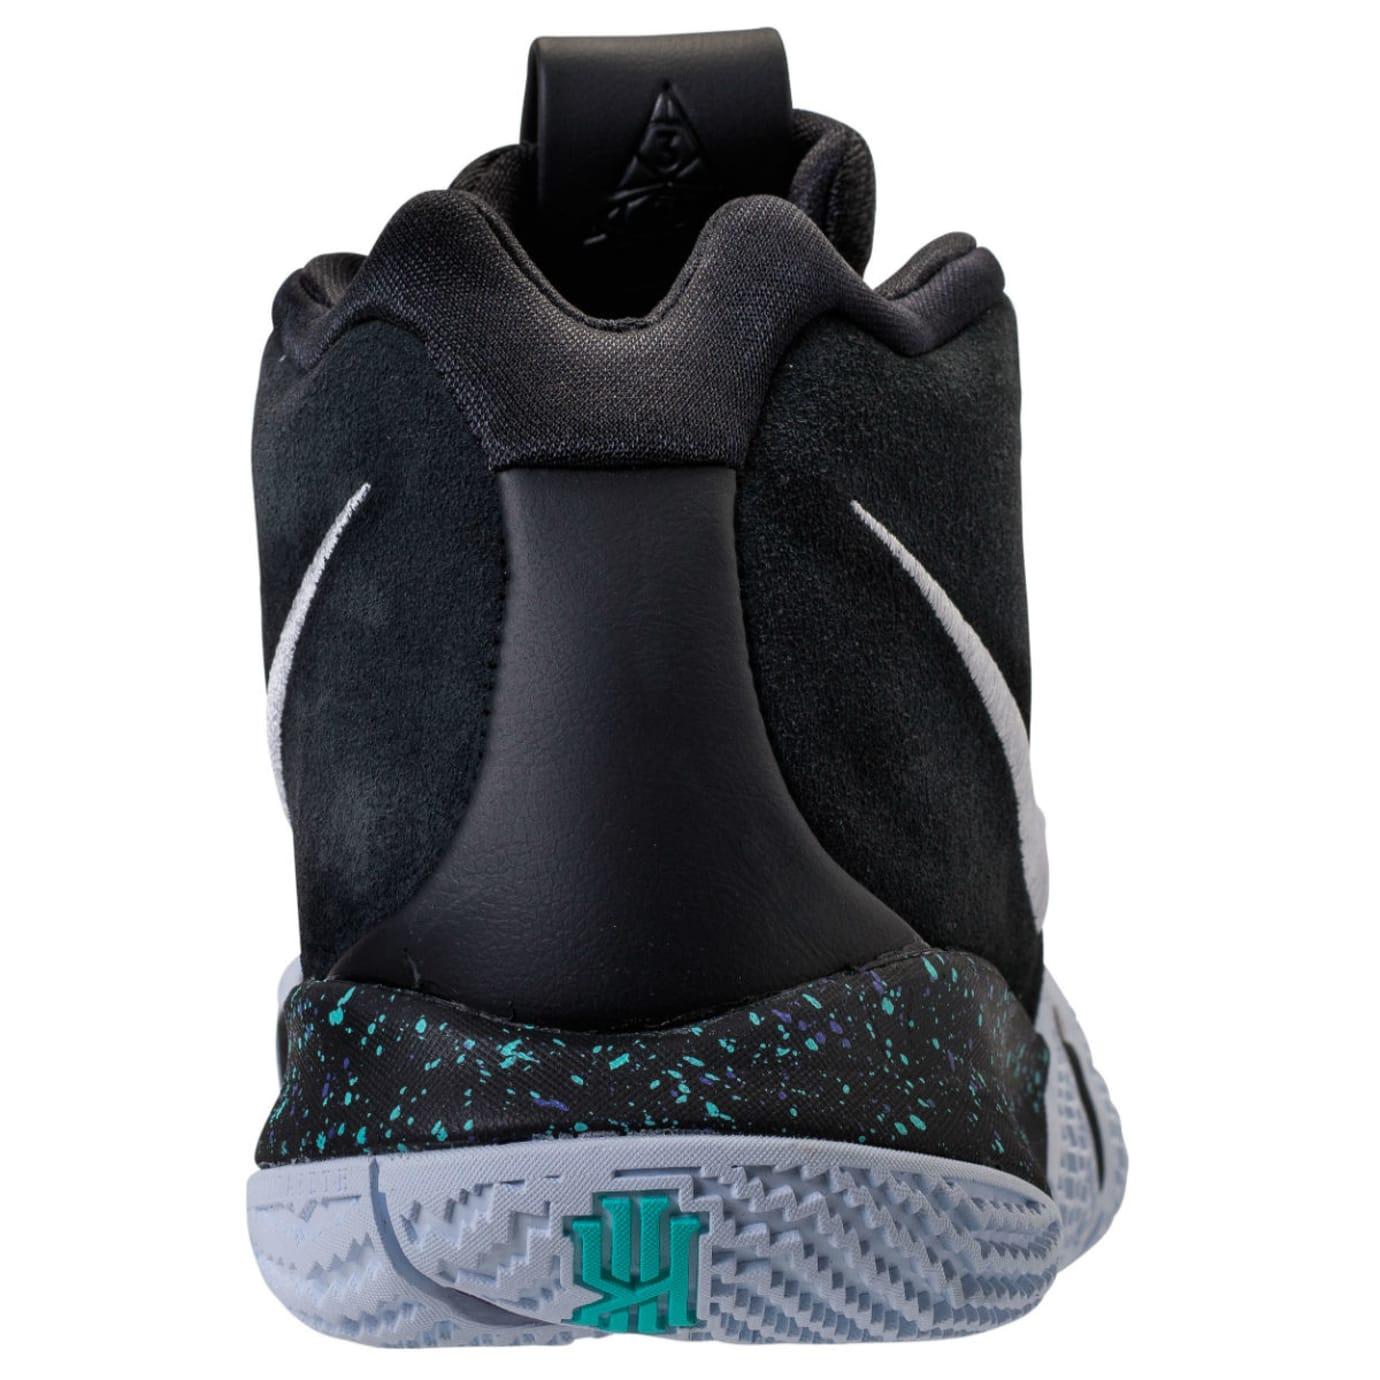 Nike Kyrie 4 Black White Release Date 943806-002 Heel